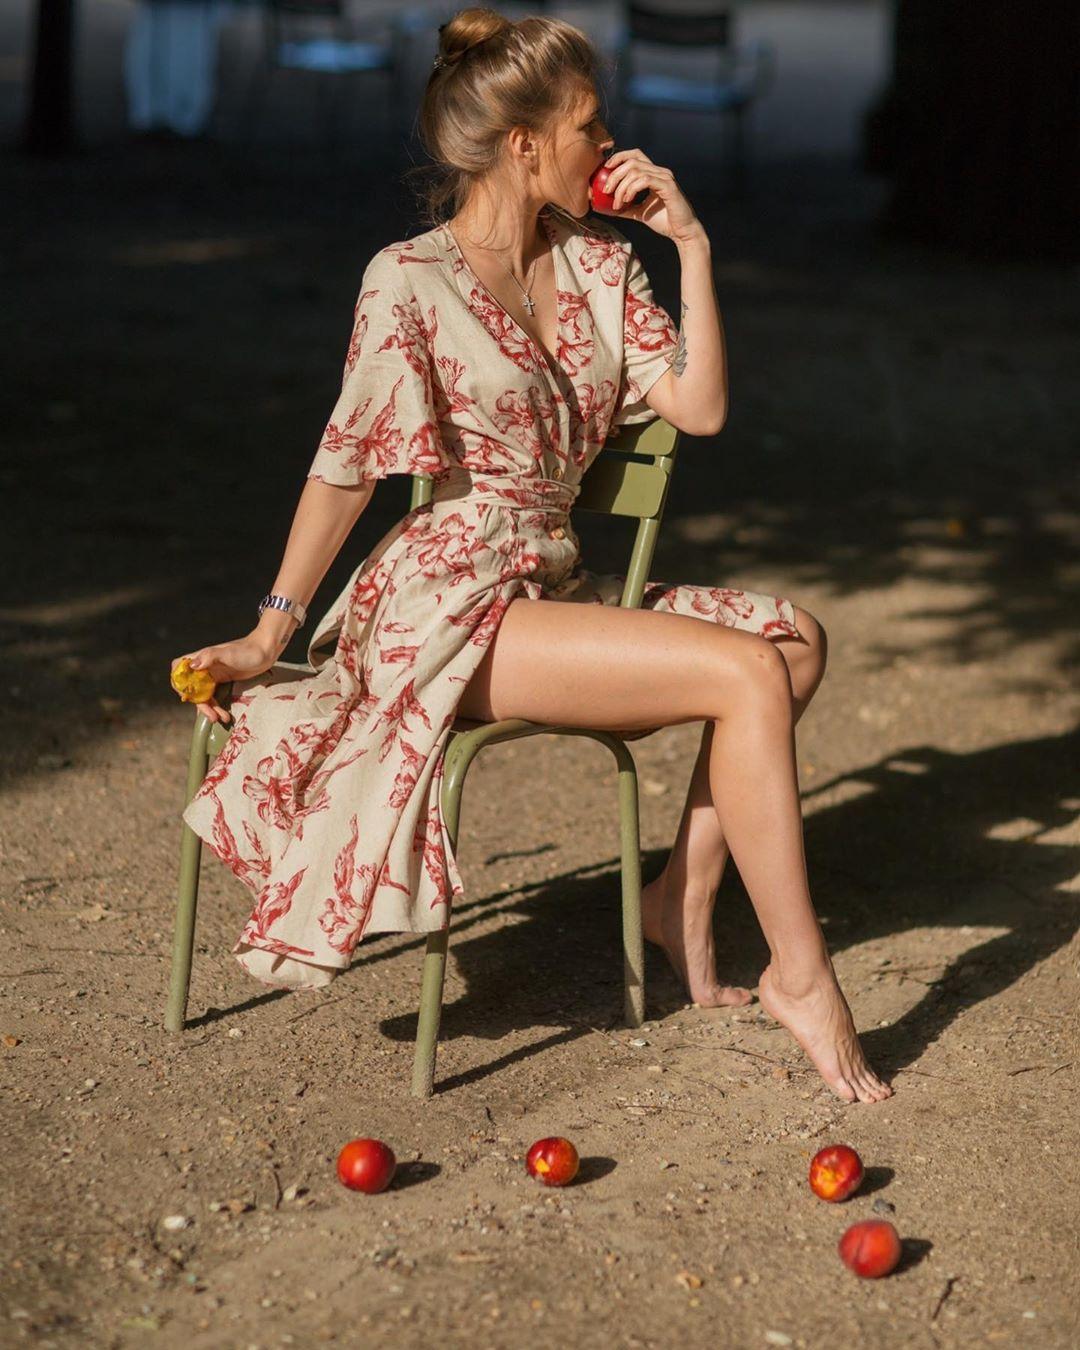 Anastasia-Mironova-Wallpapers-Insta-Fit-Bio-7